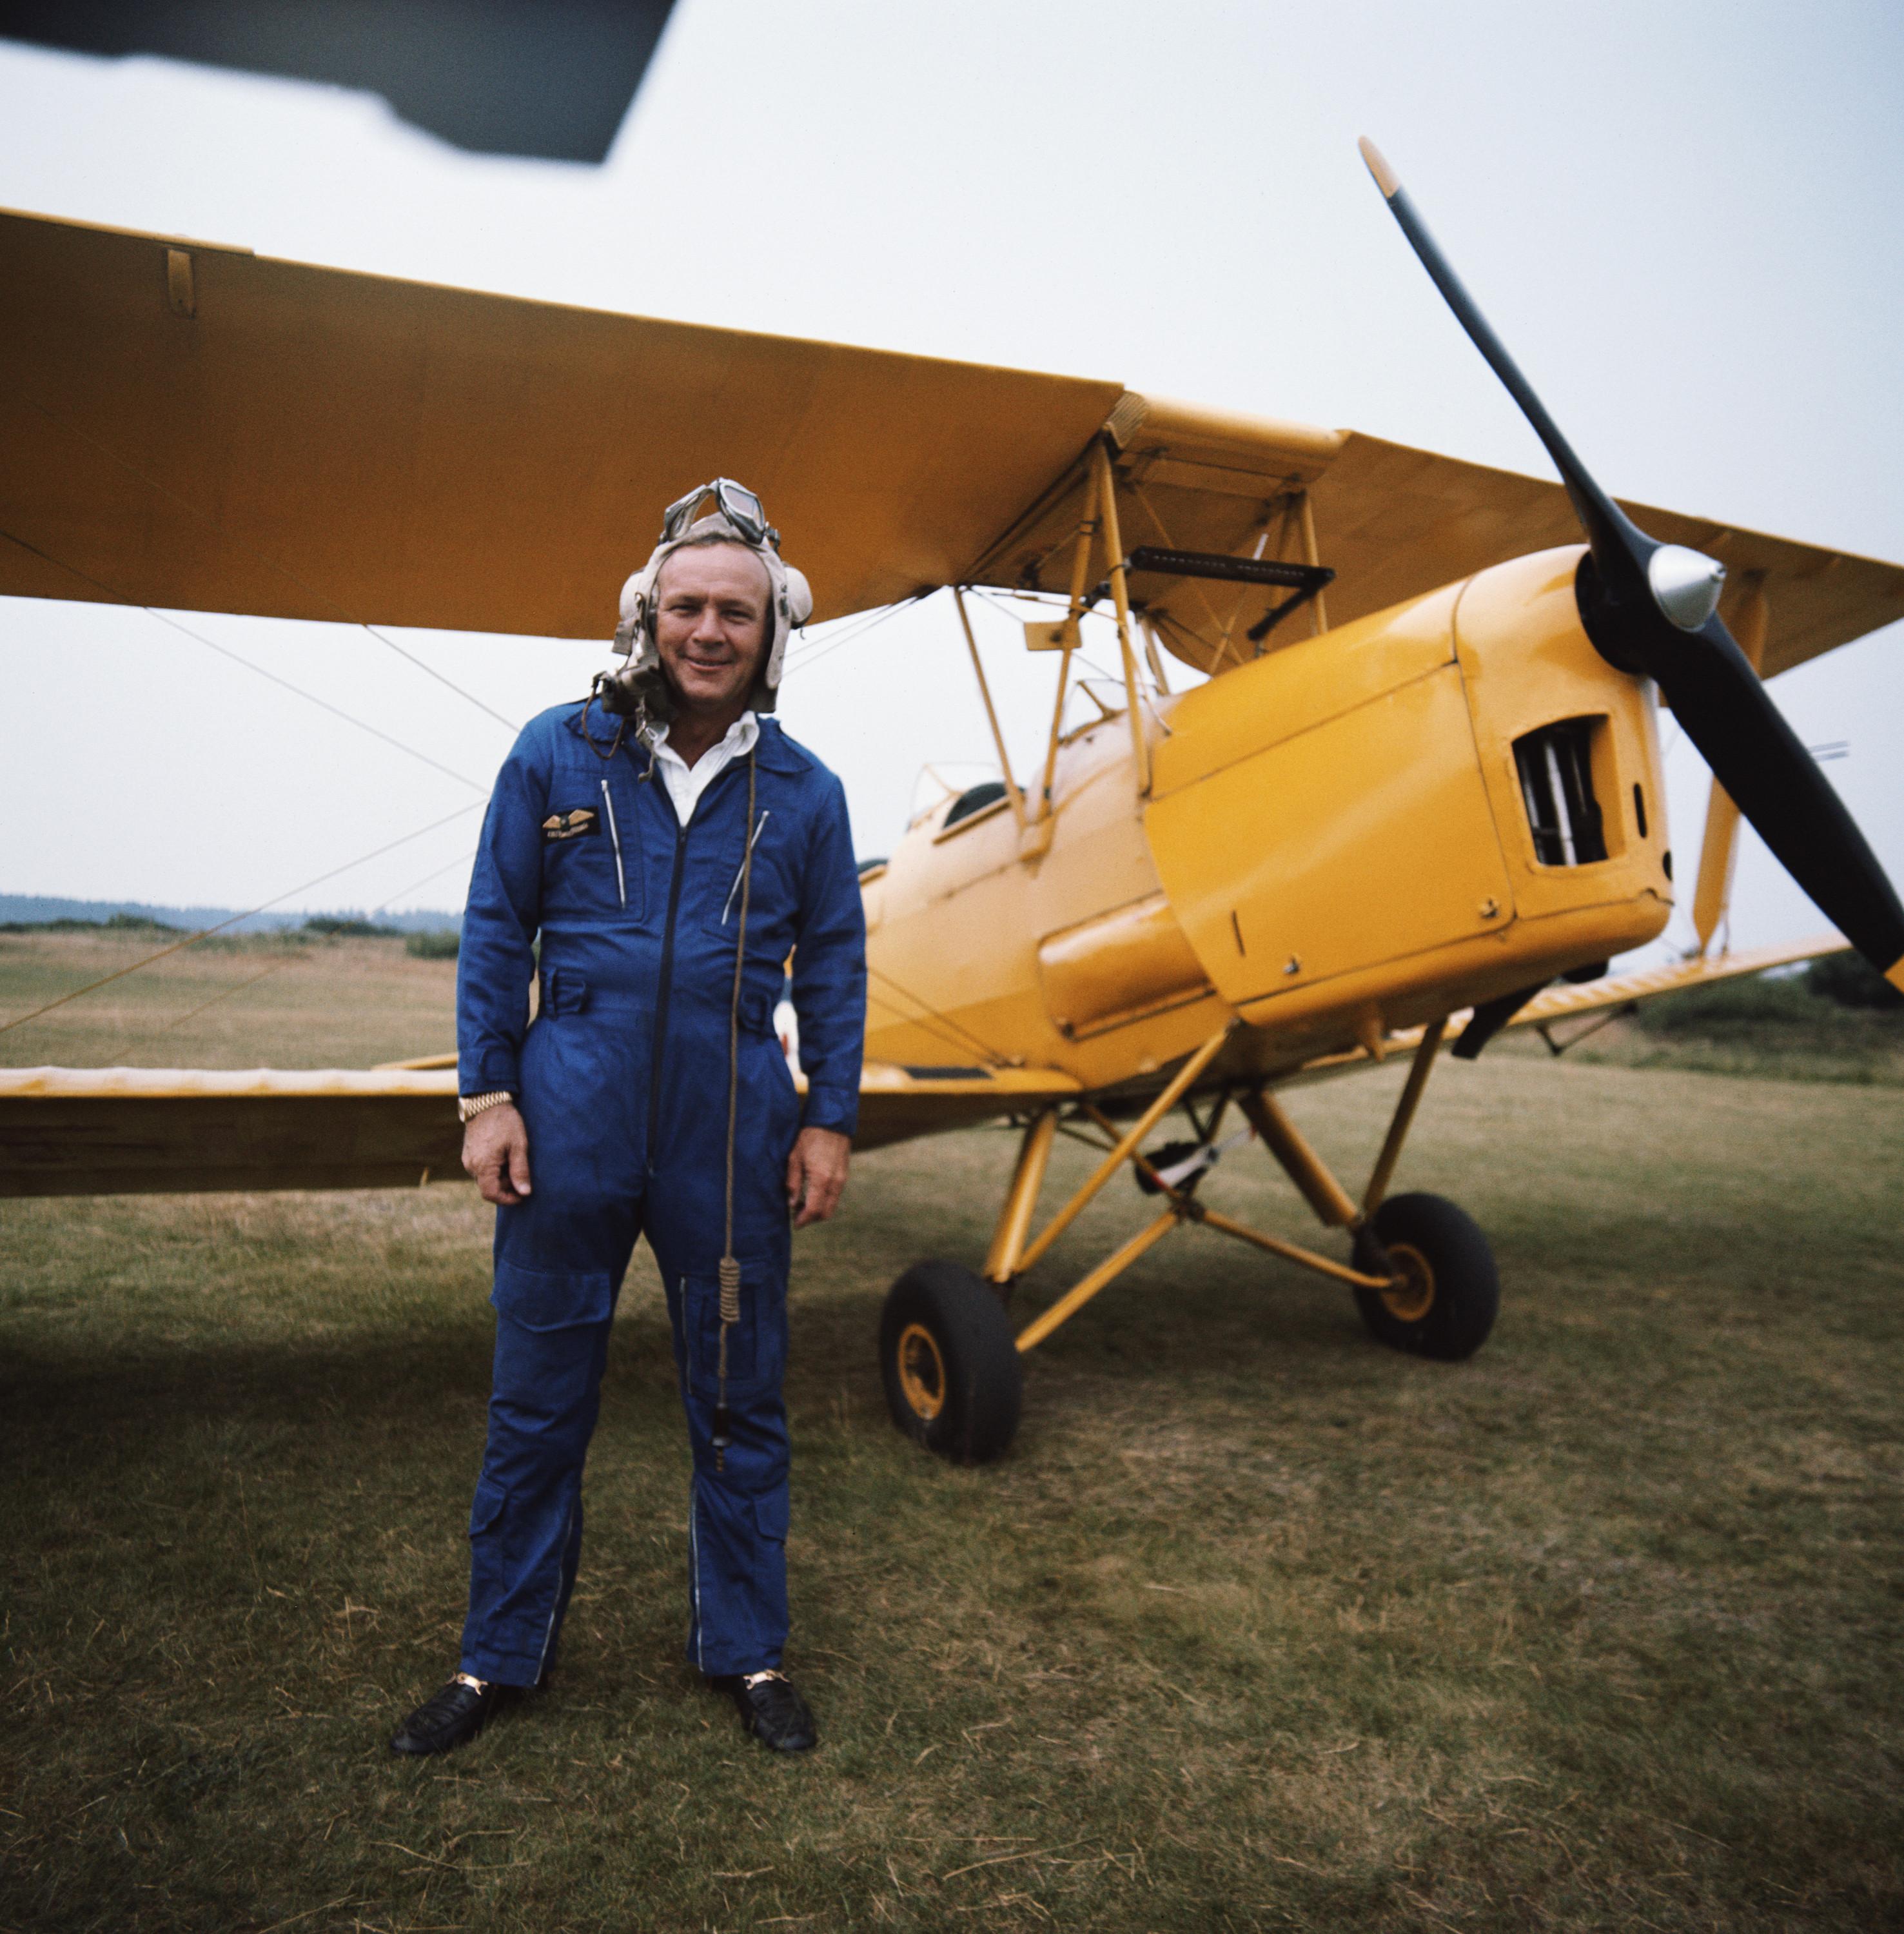 Arnold Palmer stands next to a bi-plane.